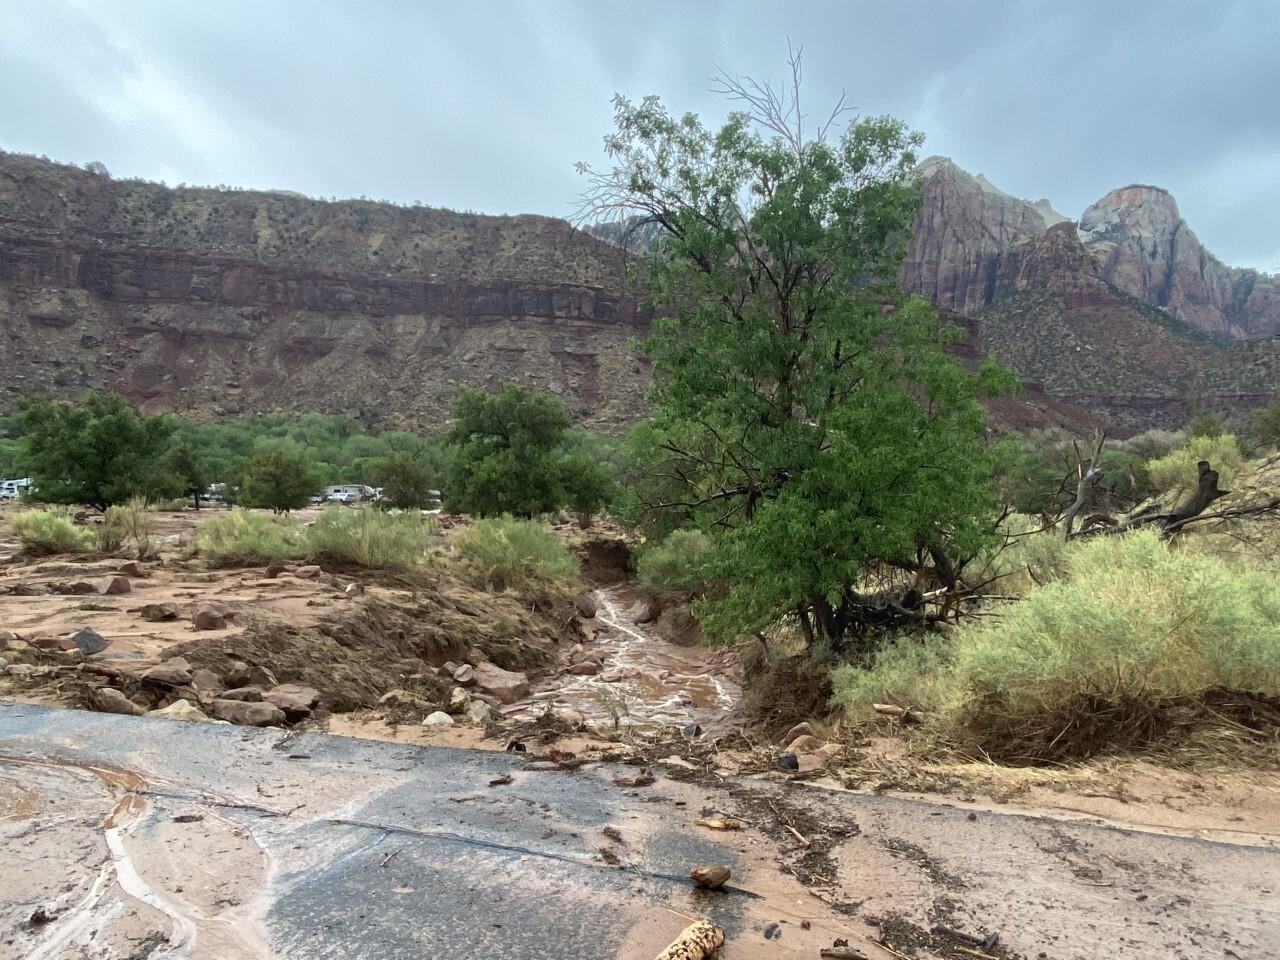 Zion National Park_debris on road near VC_6_29_2021.jpg